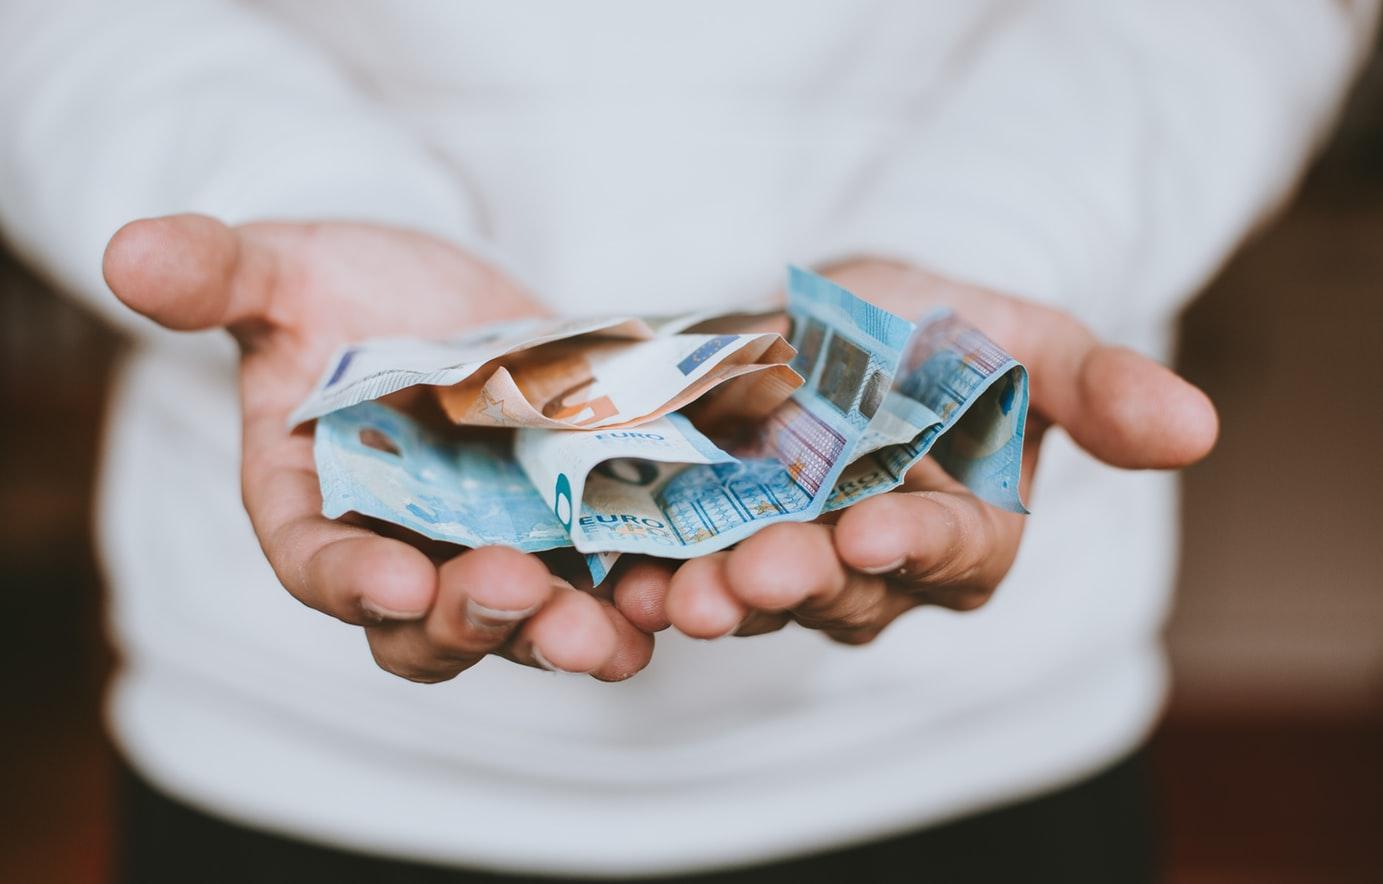 italiani-legati-soldi-contanti